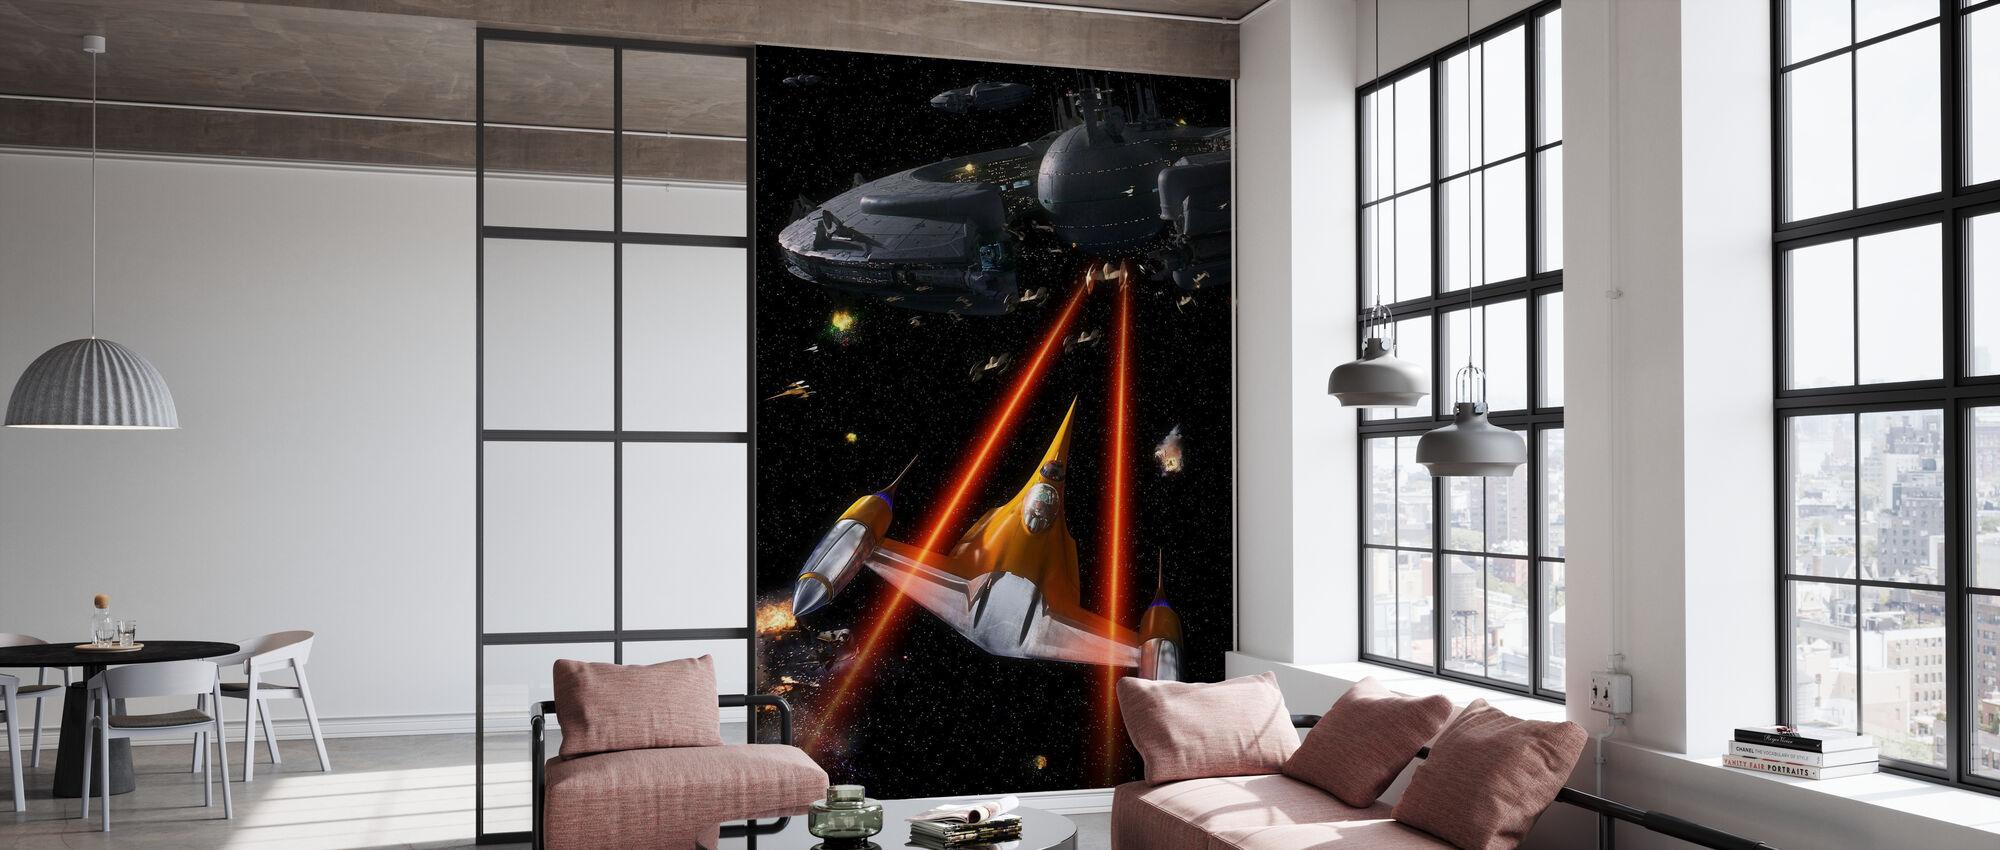 Star Wars - Naboo Starfighters - Tapet - Kontor